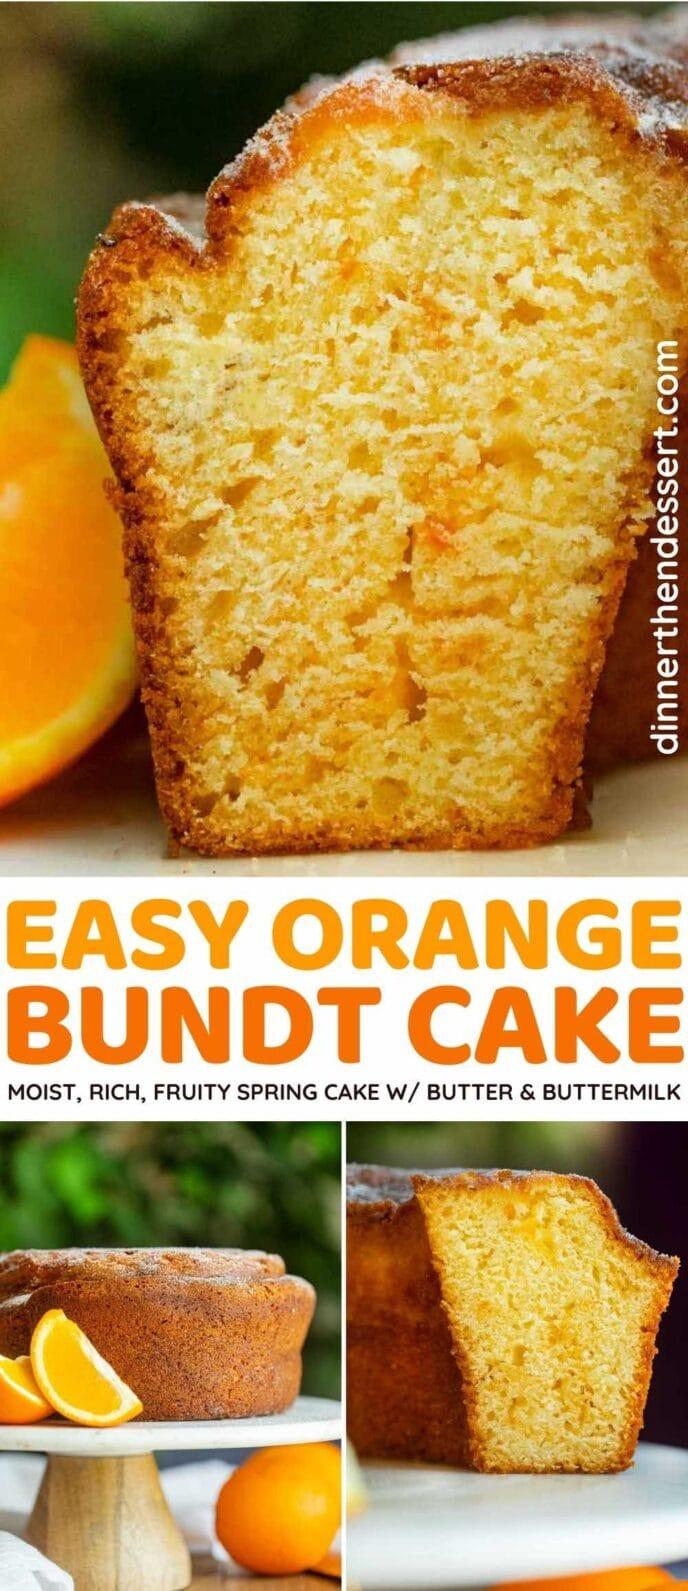 Tender Orange Bundt Cake